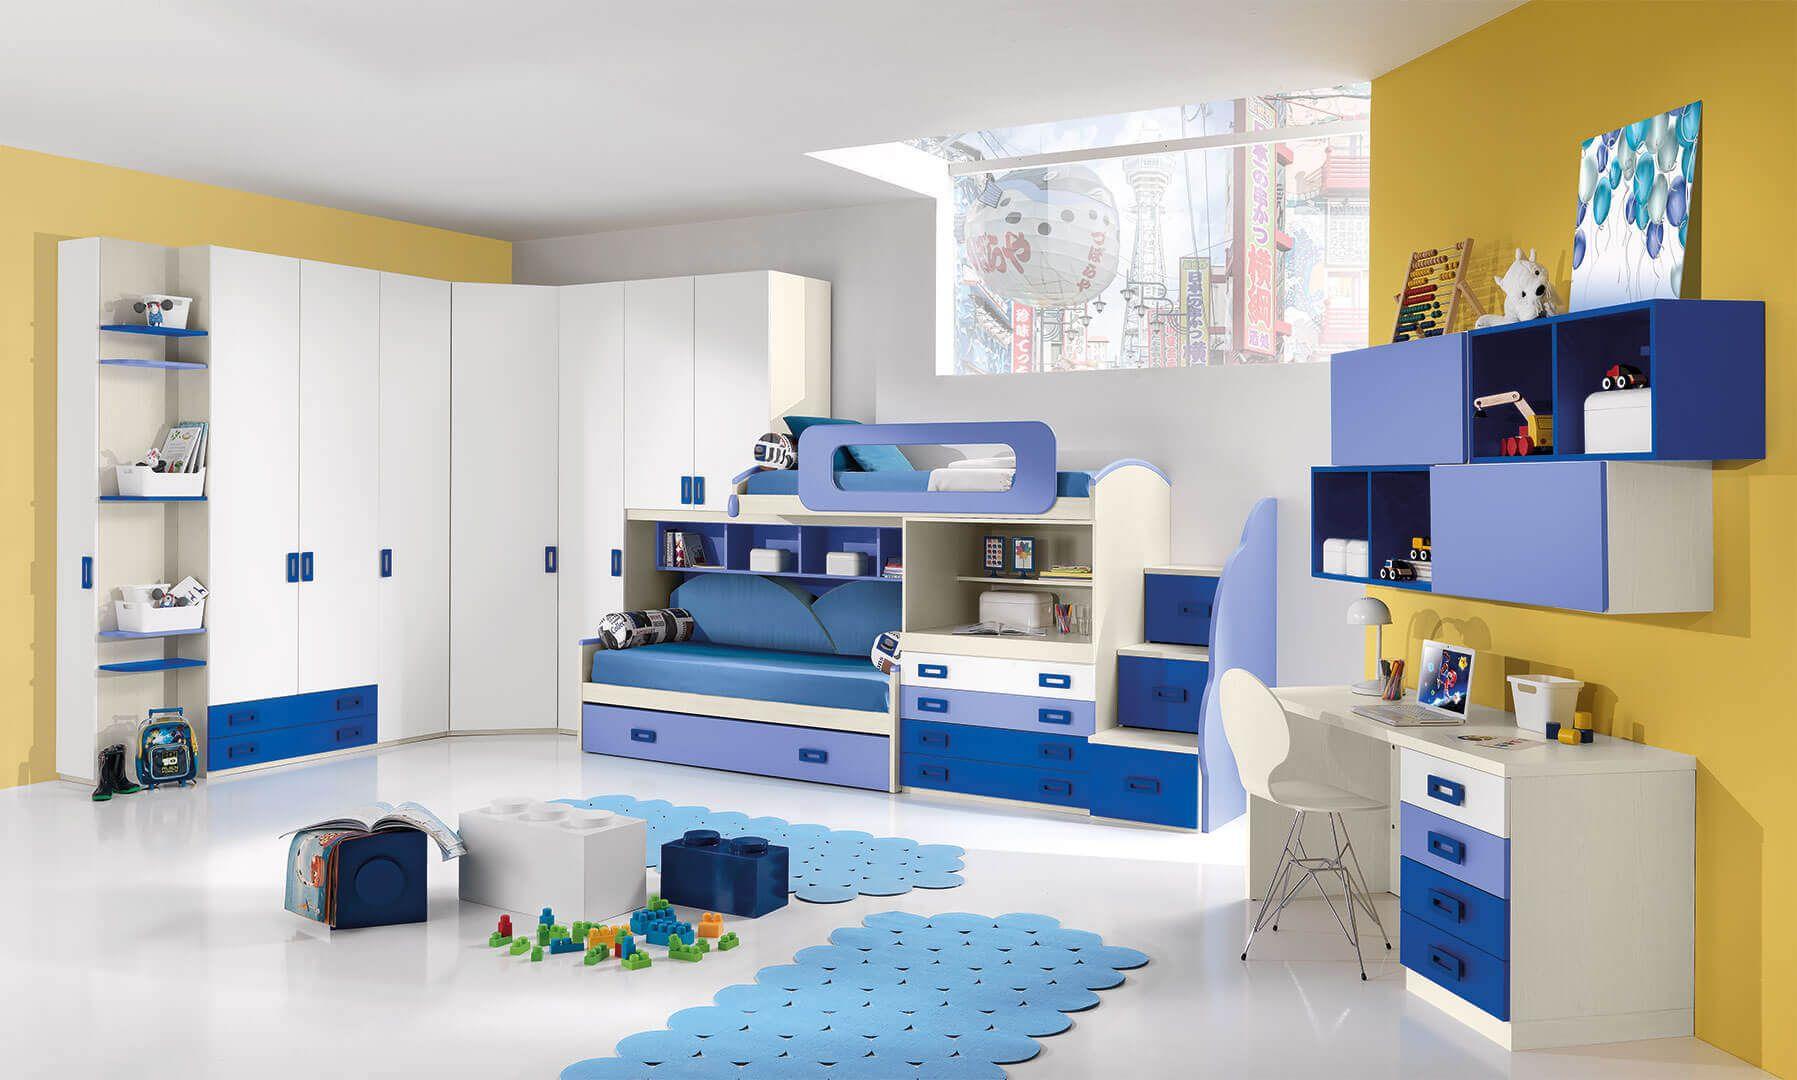 Ikea O Mondo Convenienza choose bright & vibrant colors - kids bedroom decorating